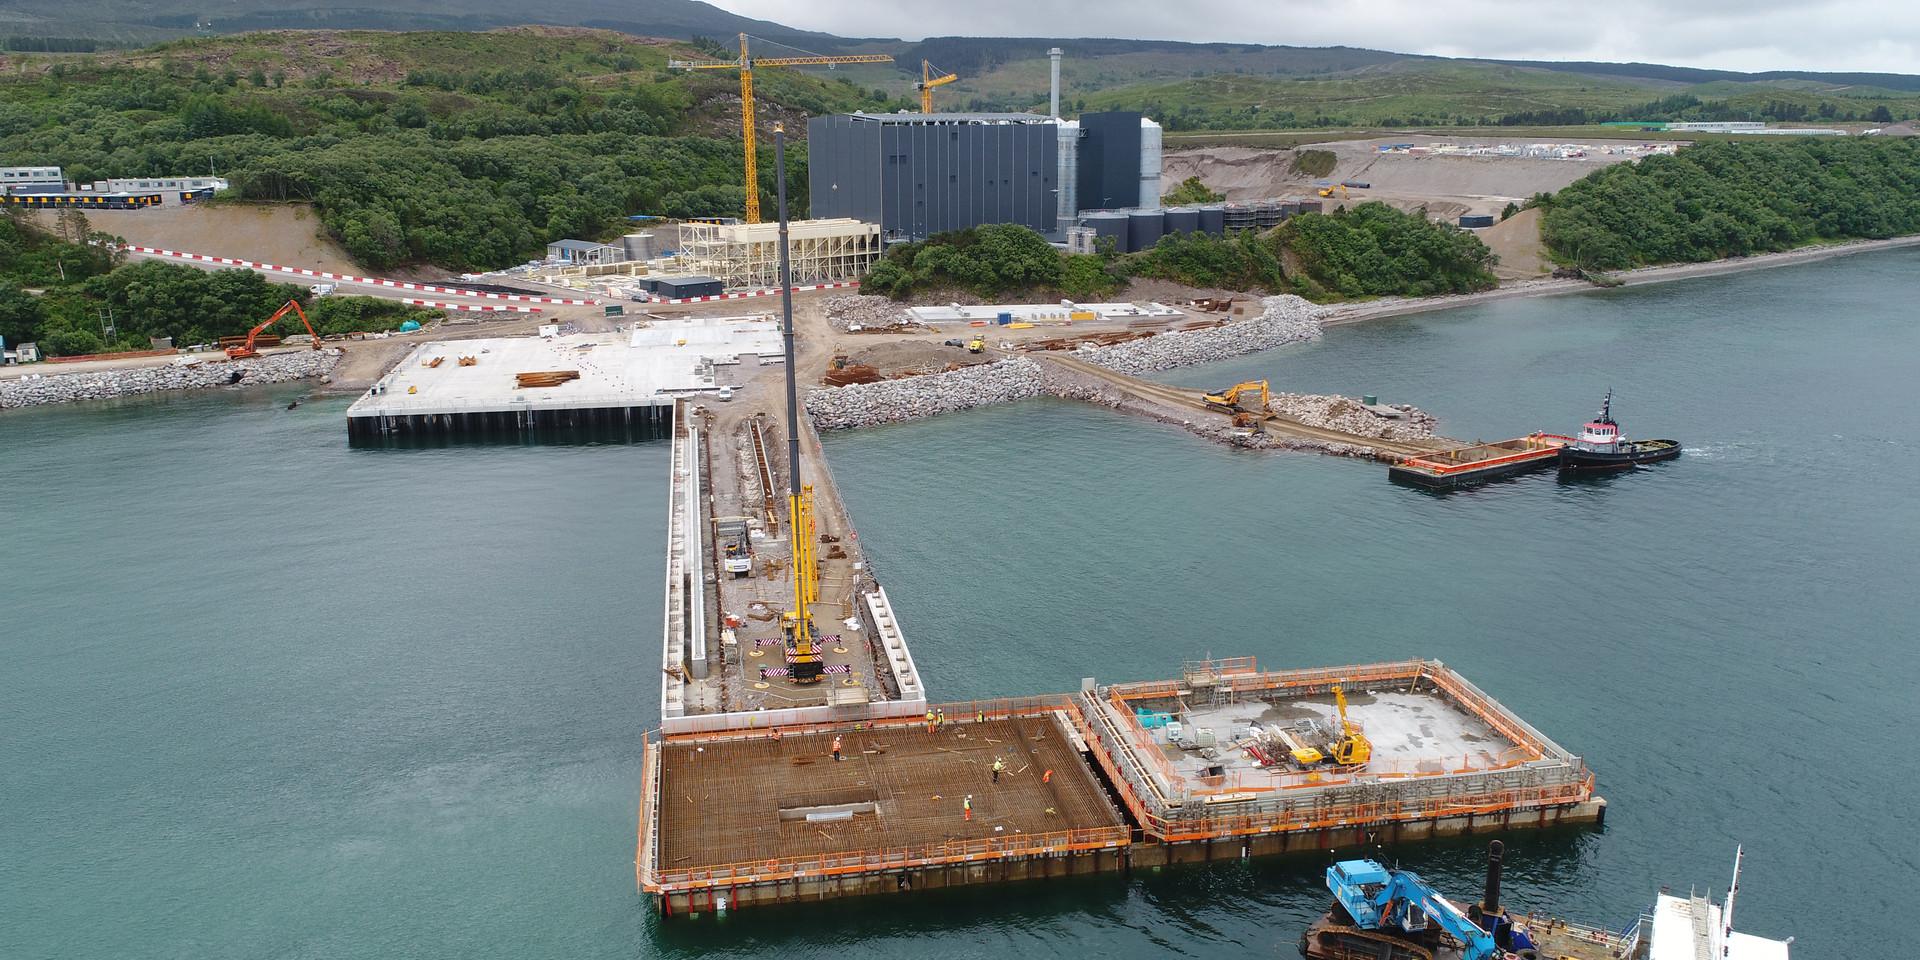 Dock Construction for Marine Harvest